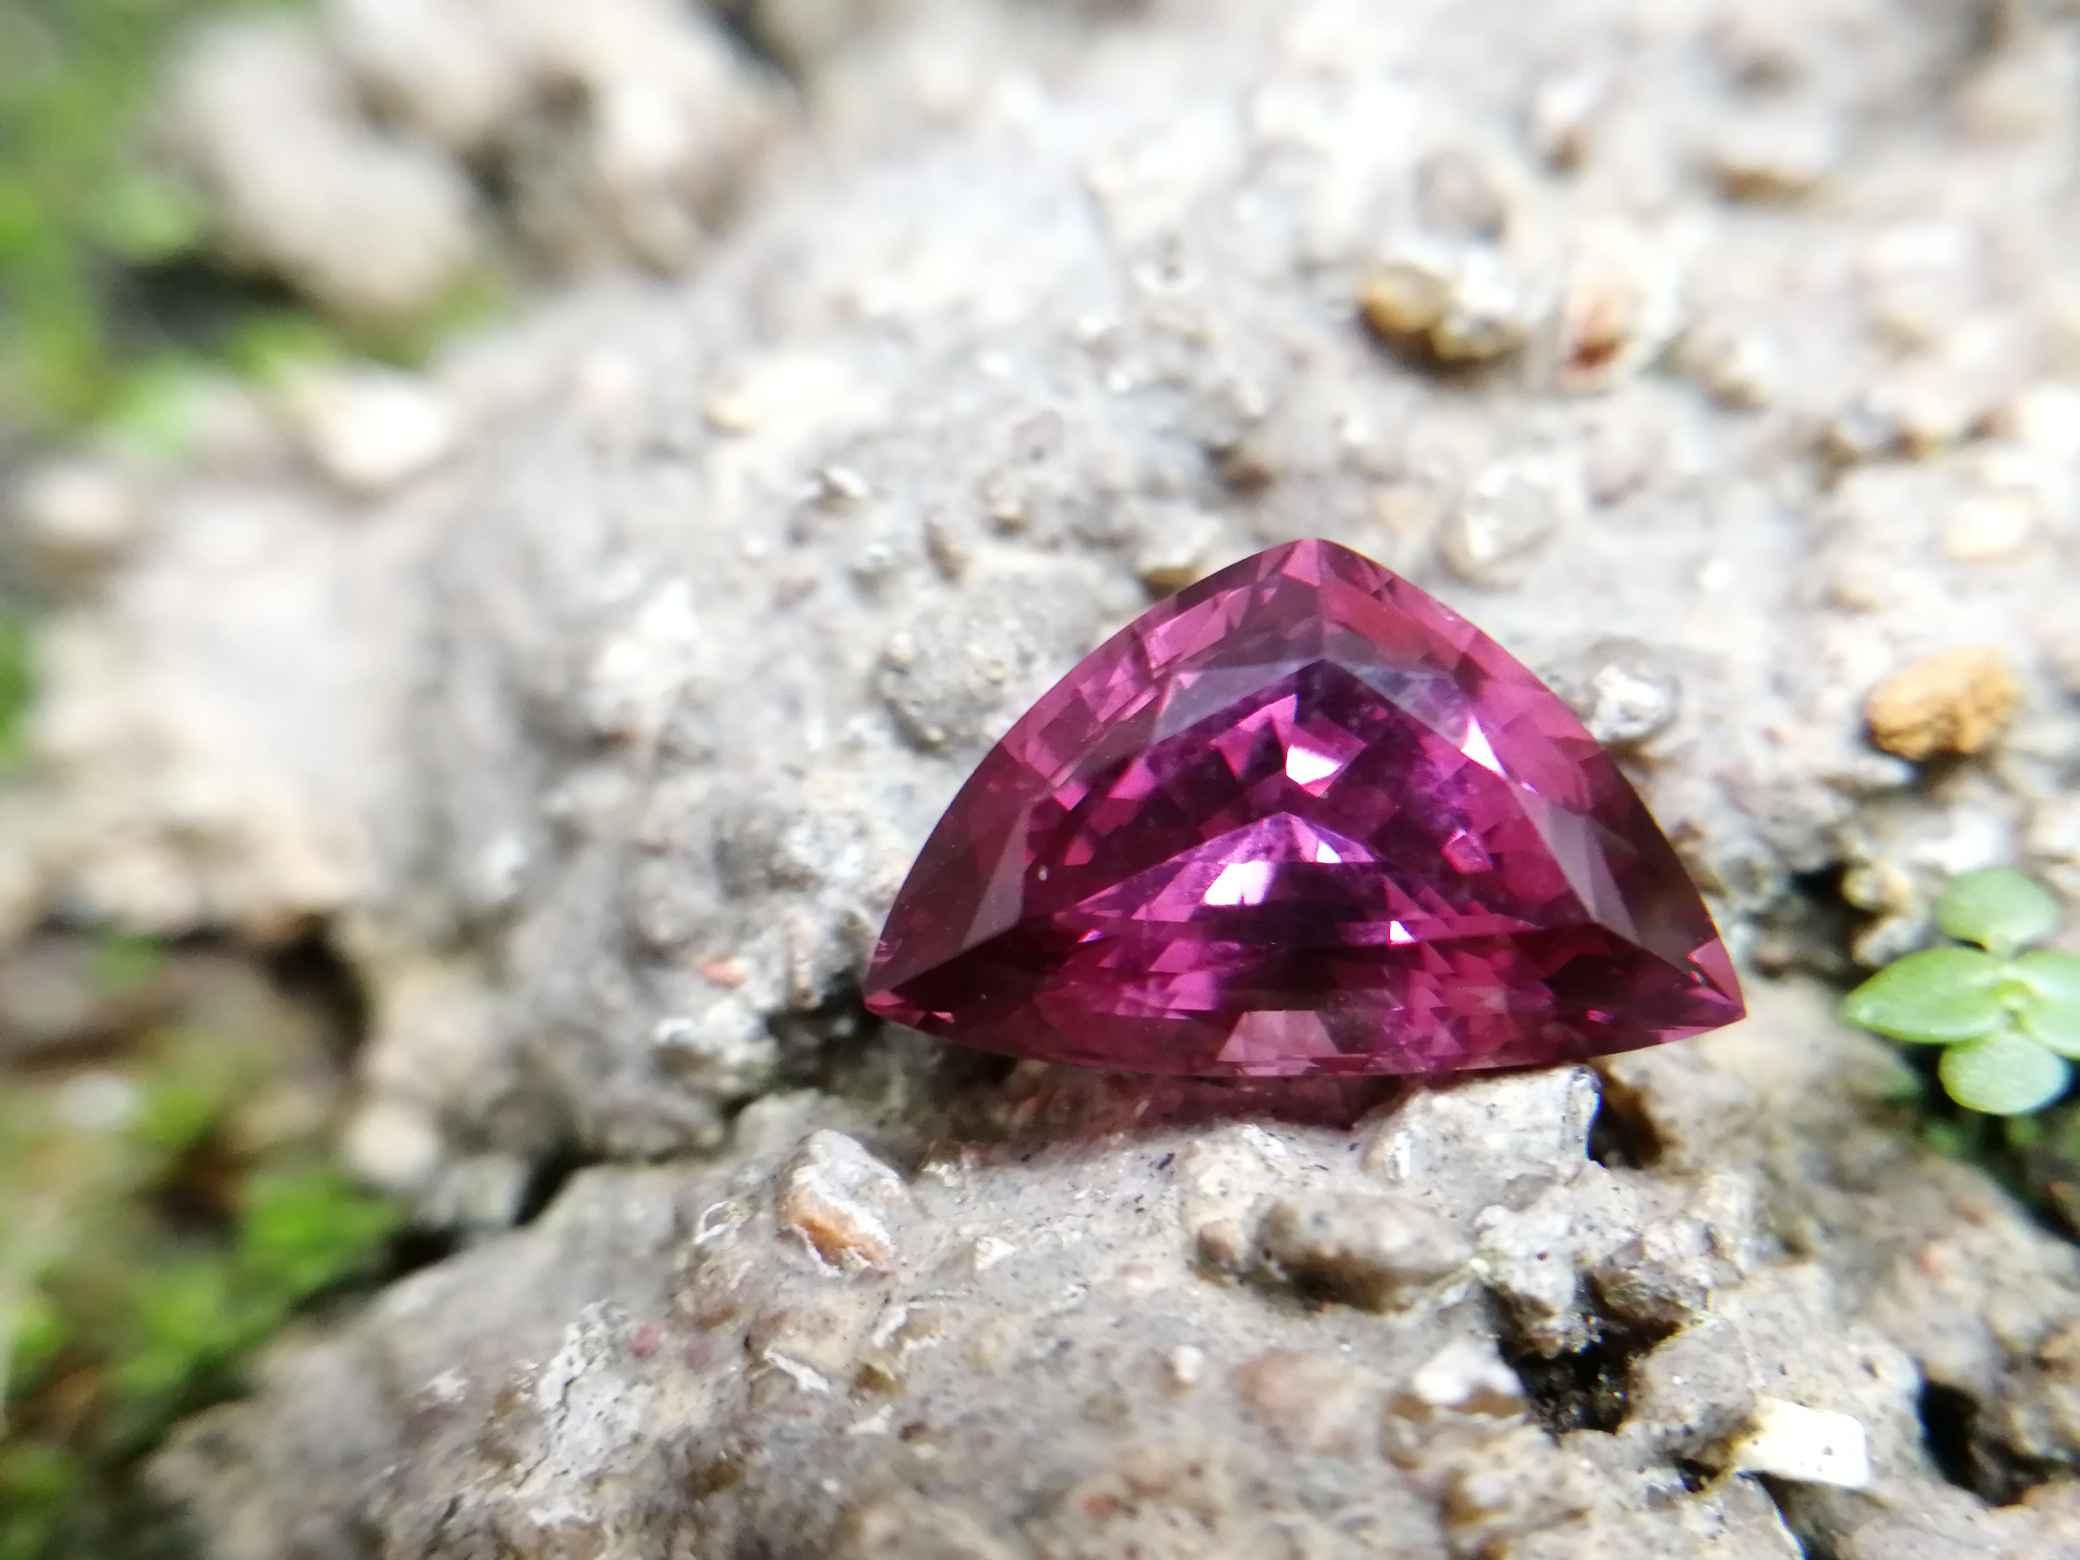 Colour : Purplish Pink Shape : Triangular Weight : 2.49 Cts Dimension : 10.8 x 6.8 x 5.4 mm Treatment : Unheated Clarity : Clean • CSL - Colored Stone Laboratory Certified ( GIA Alumina Association Member ) • CSL Memo No : 86AF34DE46E3 紫红色尖晶石 重量 : 2.49 卡拉 尺寸 : 10.8 x 6.8 x 5.4 mm 颜色 : 紫红色 透明 : 好透明 形状 : 三角形 清晰度 : 清洁 治疗: 没有加热